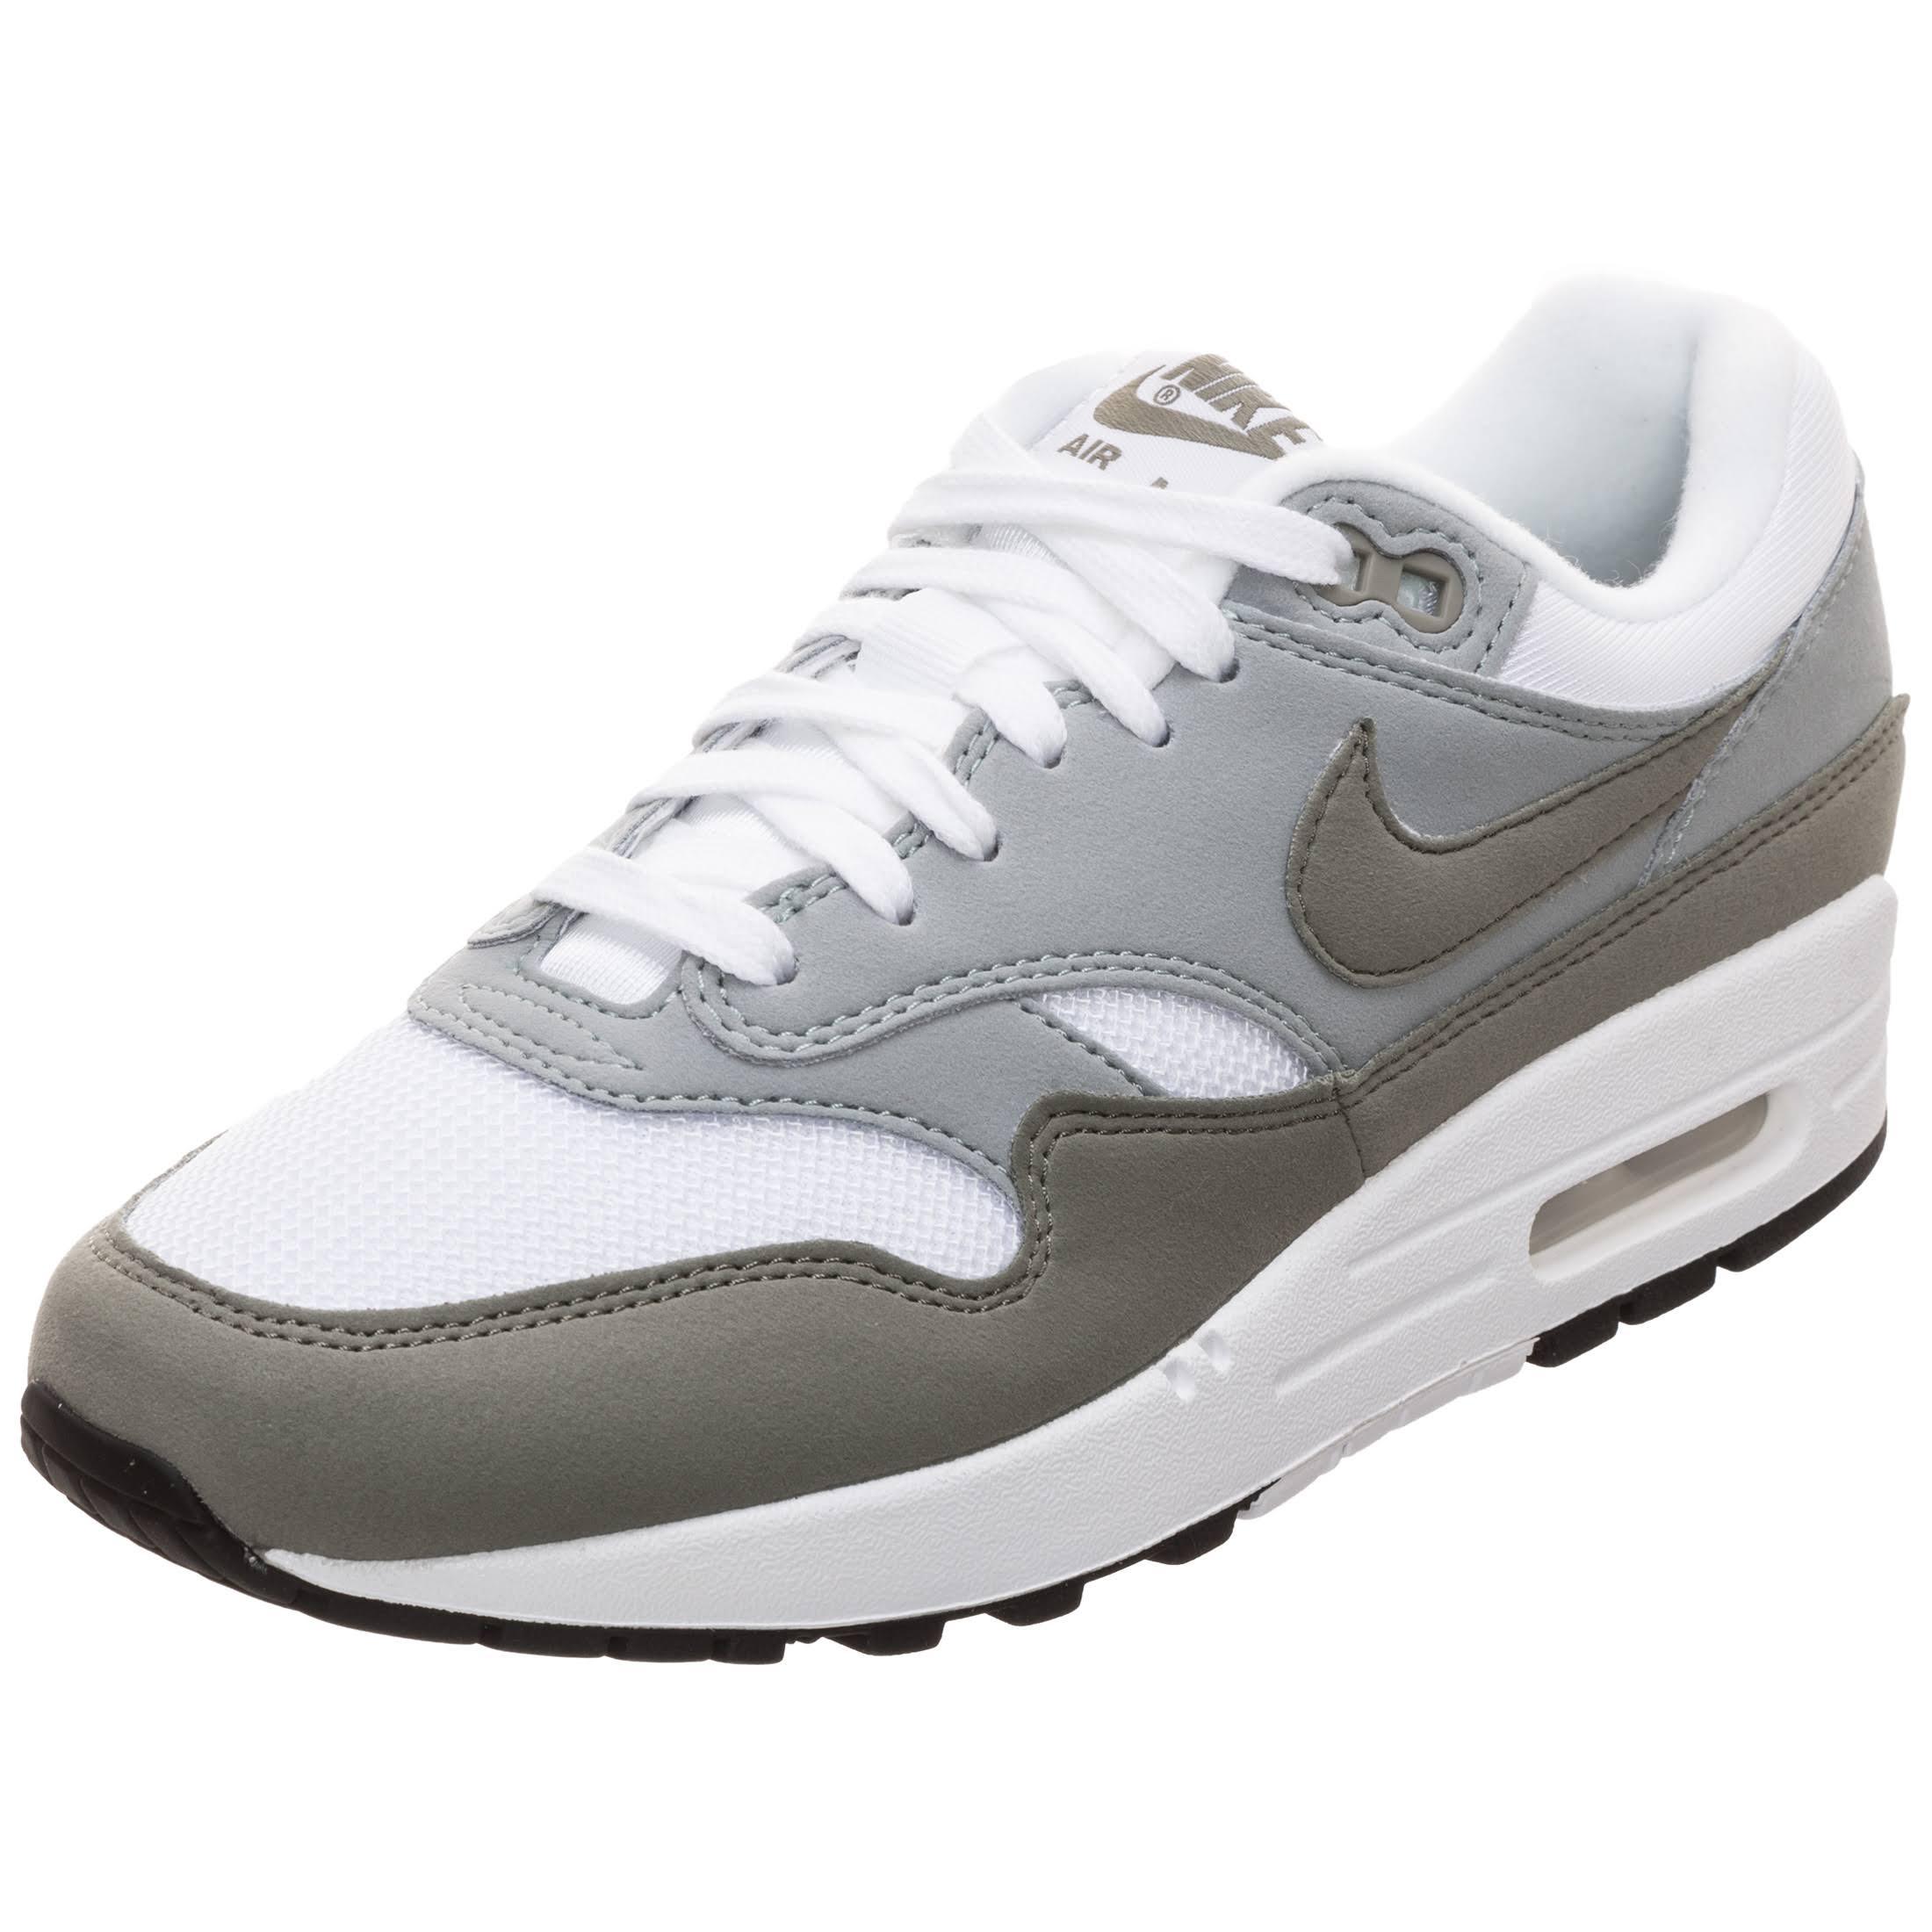 1 1 Max 37 Khaki 2 Air Türkis Größe Damen Sneakers Weiß Nike nqw6I70F6